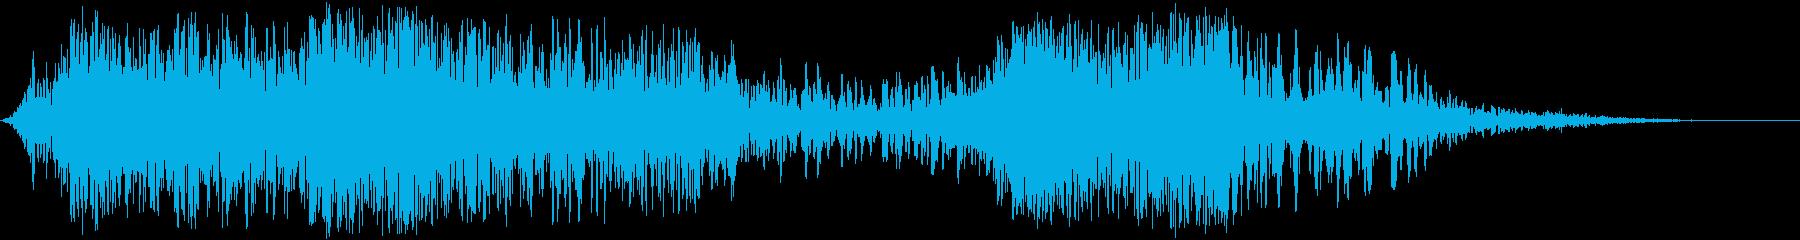 Action Whoosh FX 05の再生済みの波形